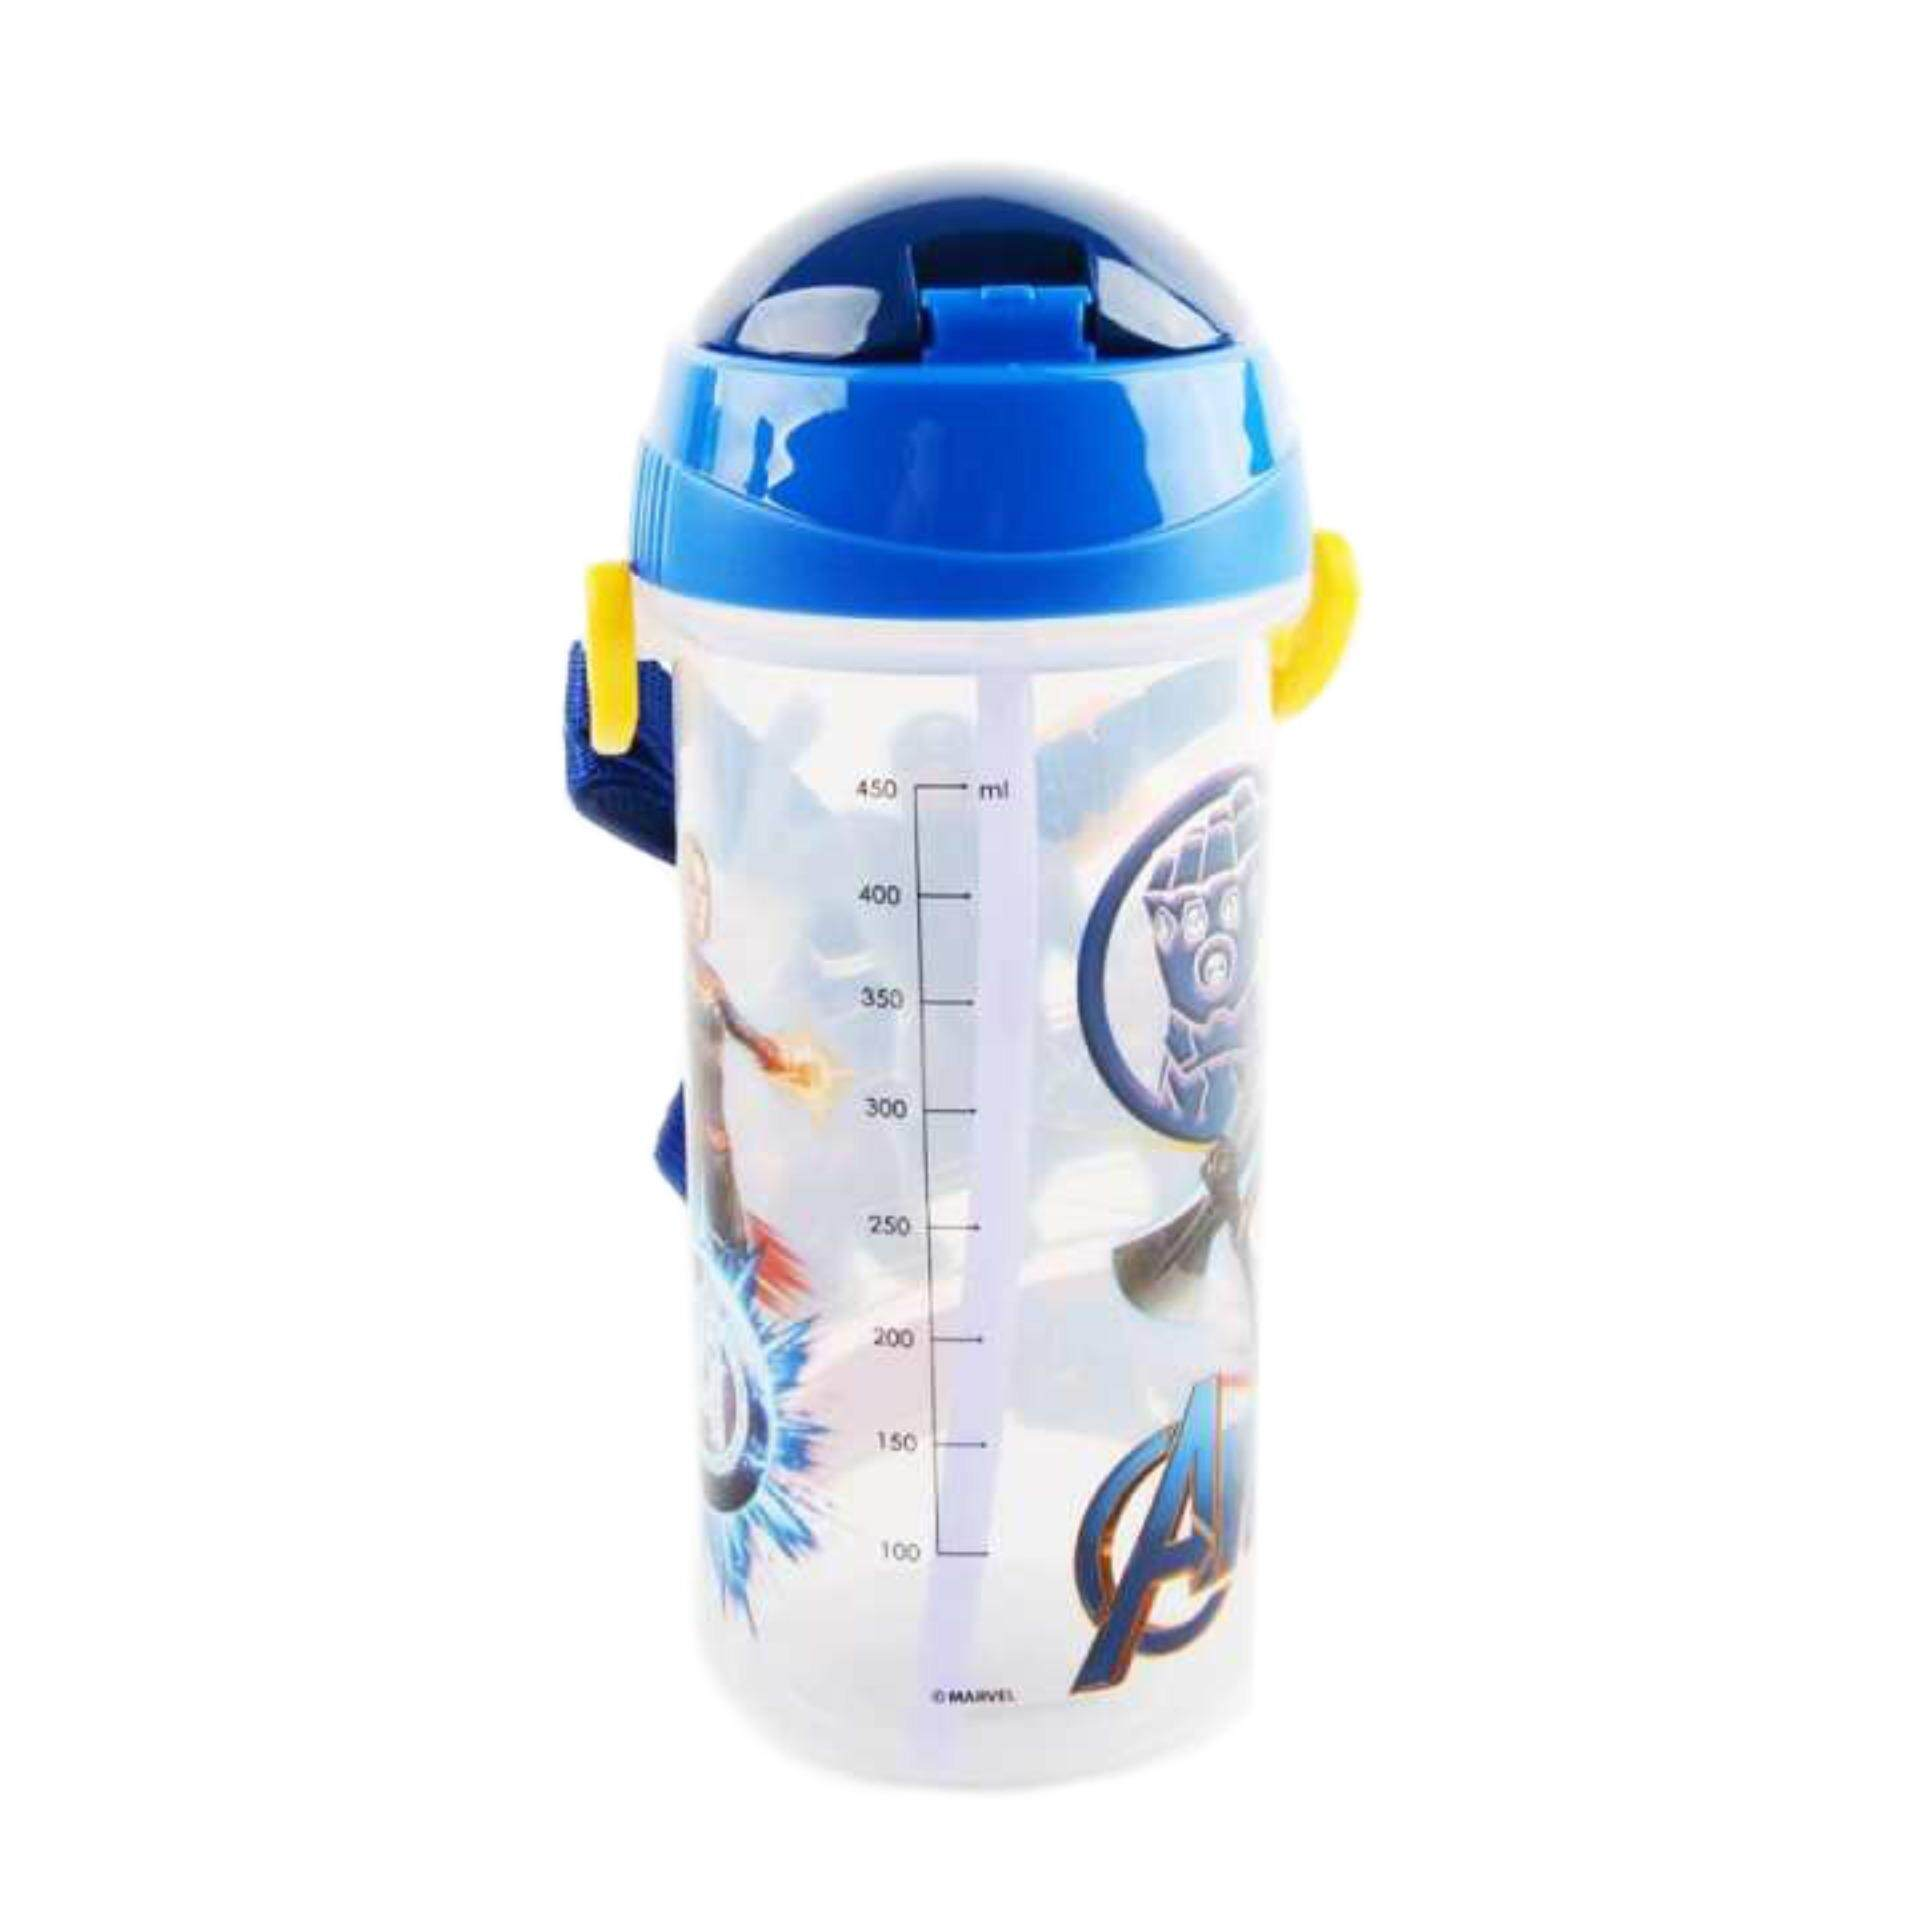 Marvel Avengers Endgame 550ML BPA Free Tritan Bottle With Straw - Blue Colour